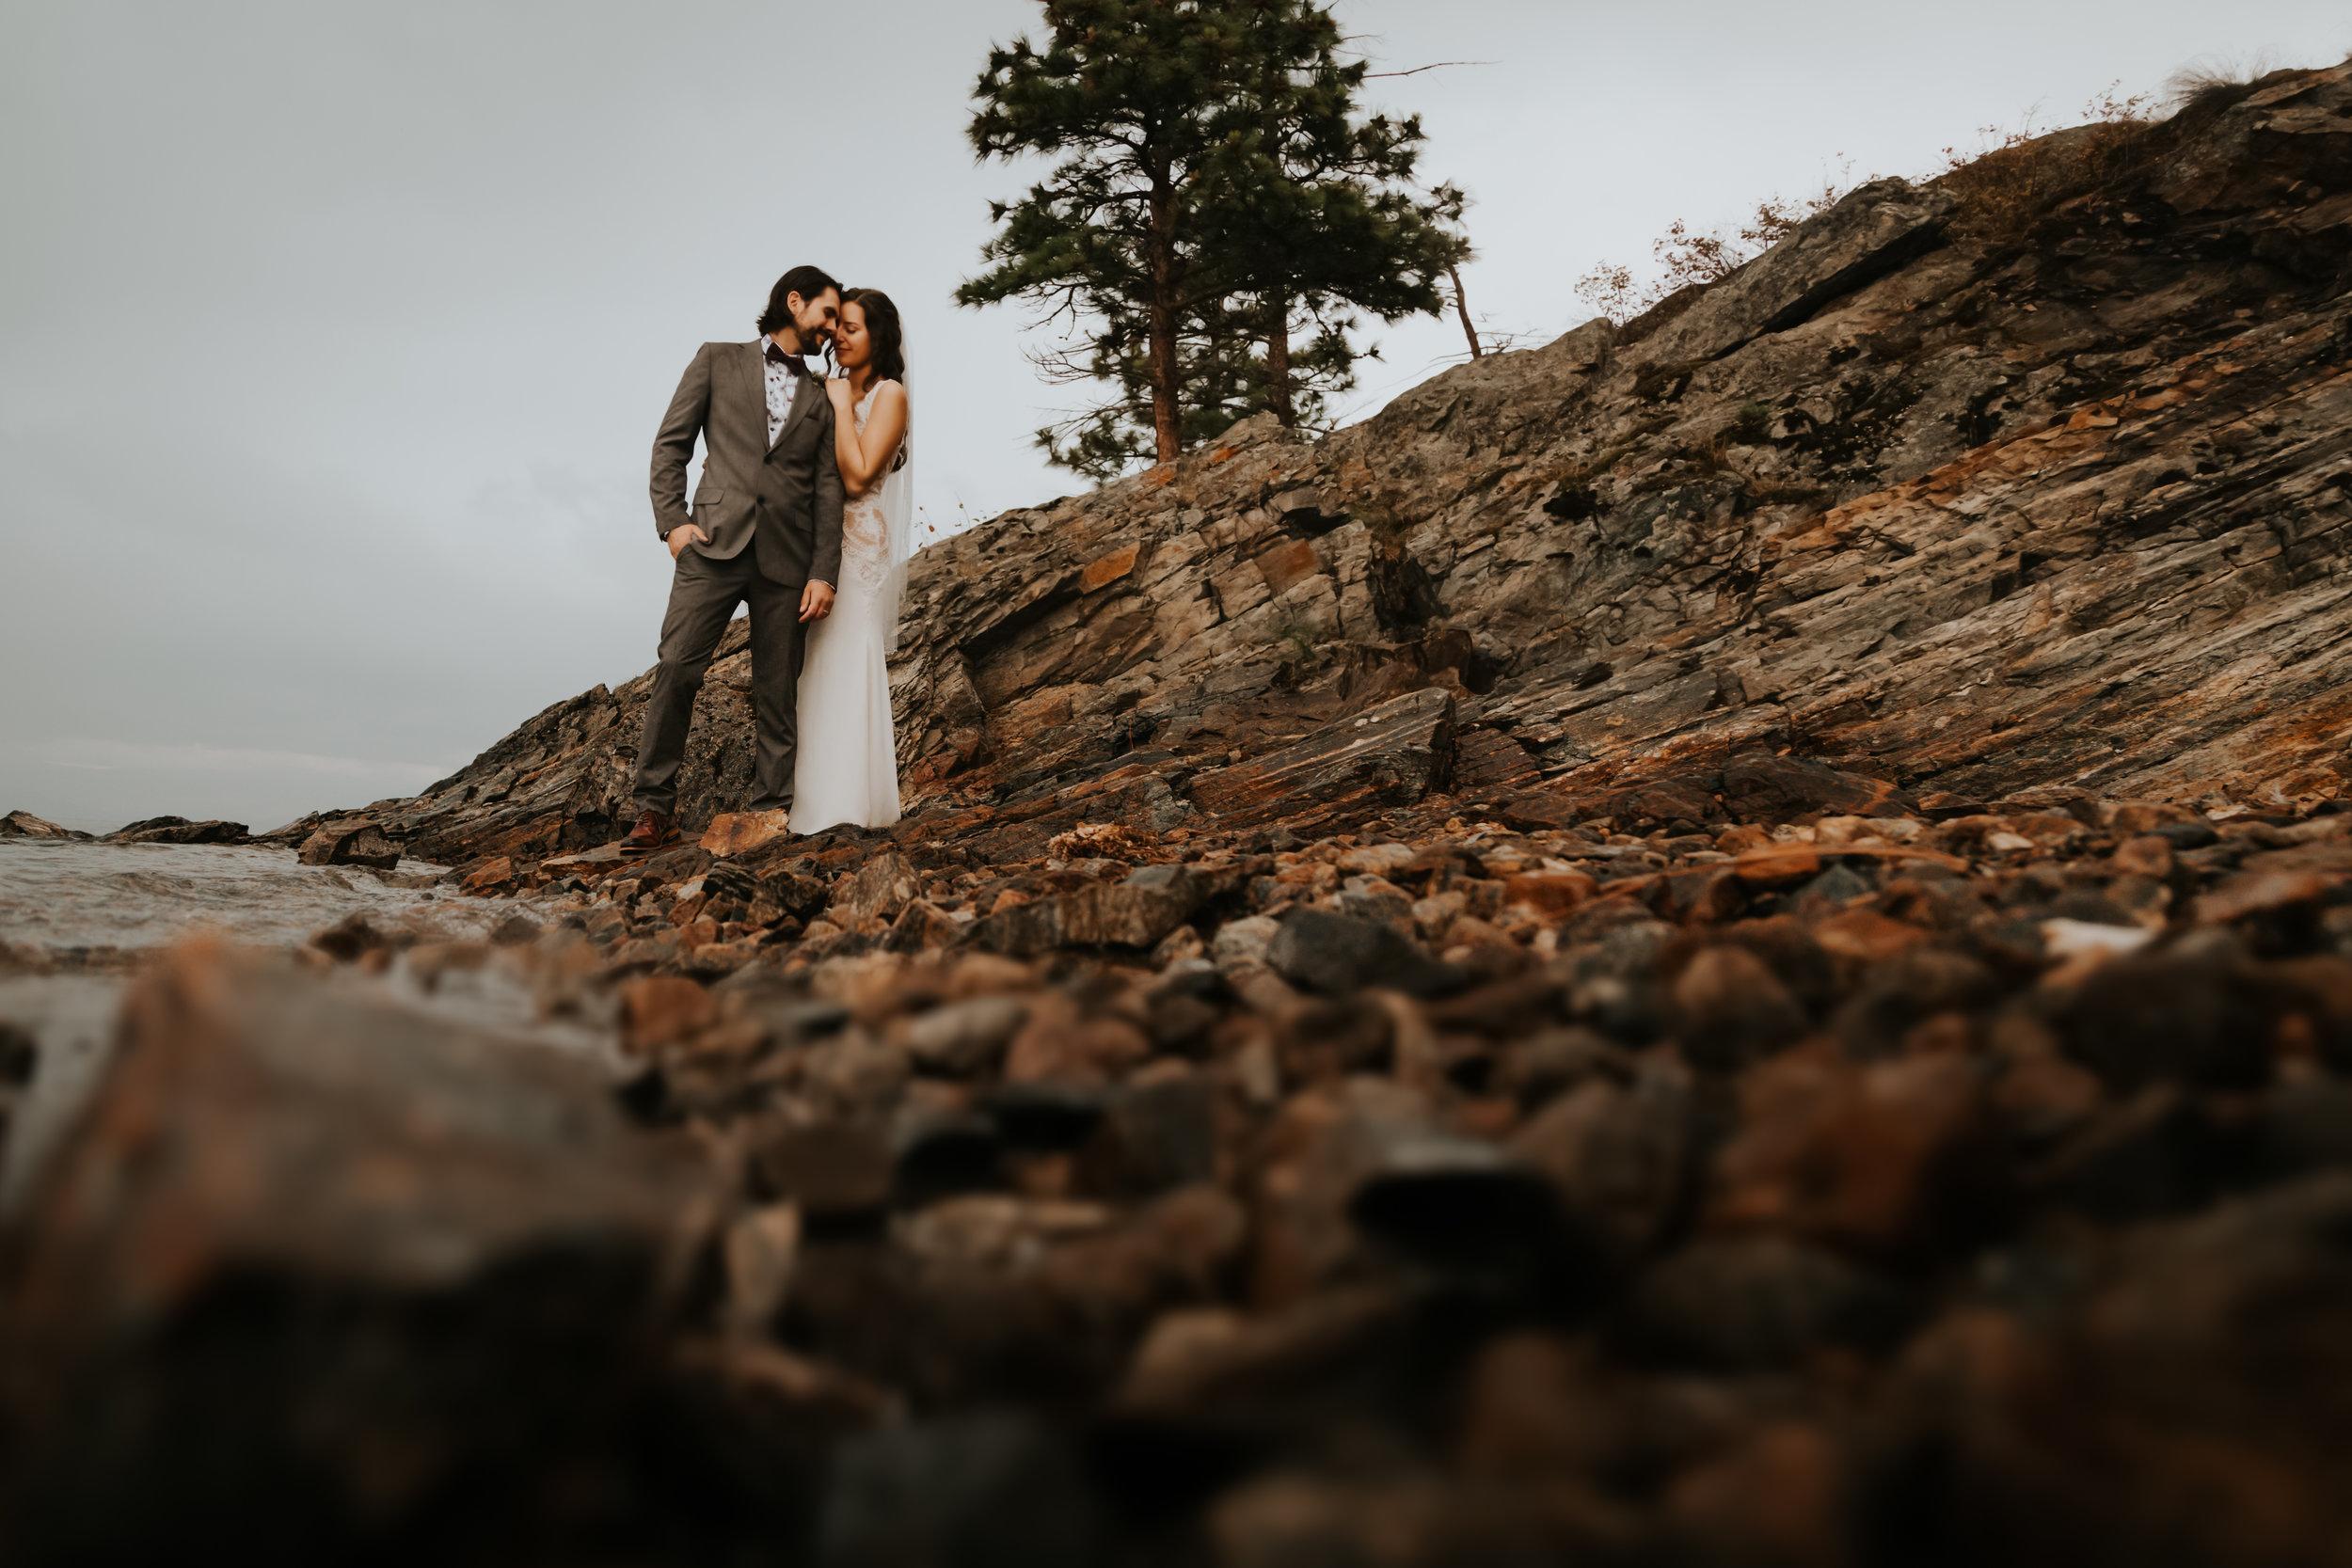 kelowna-wedding-photographer-27.jpg